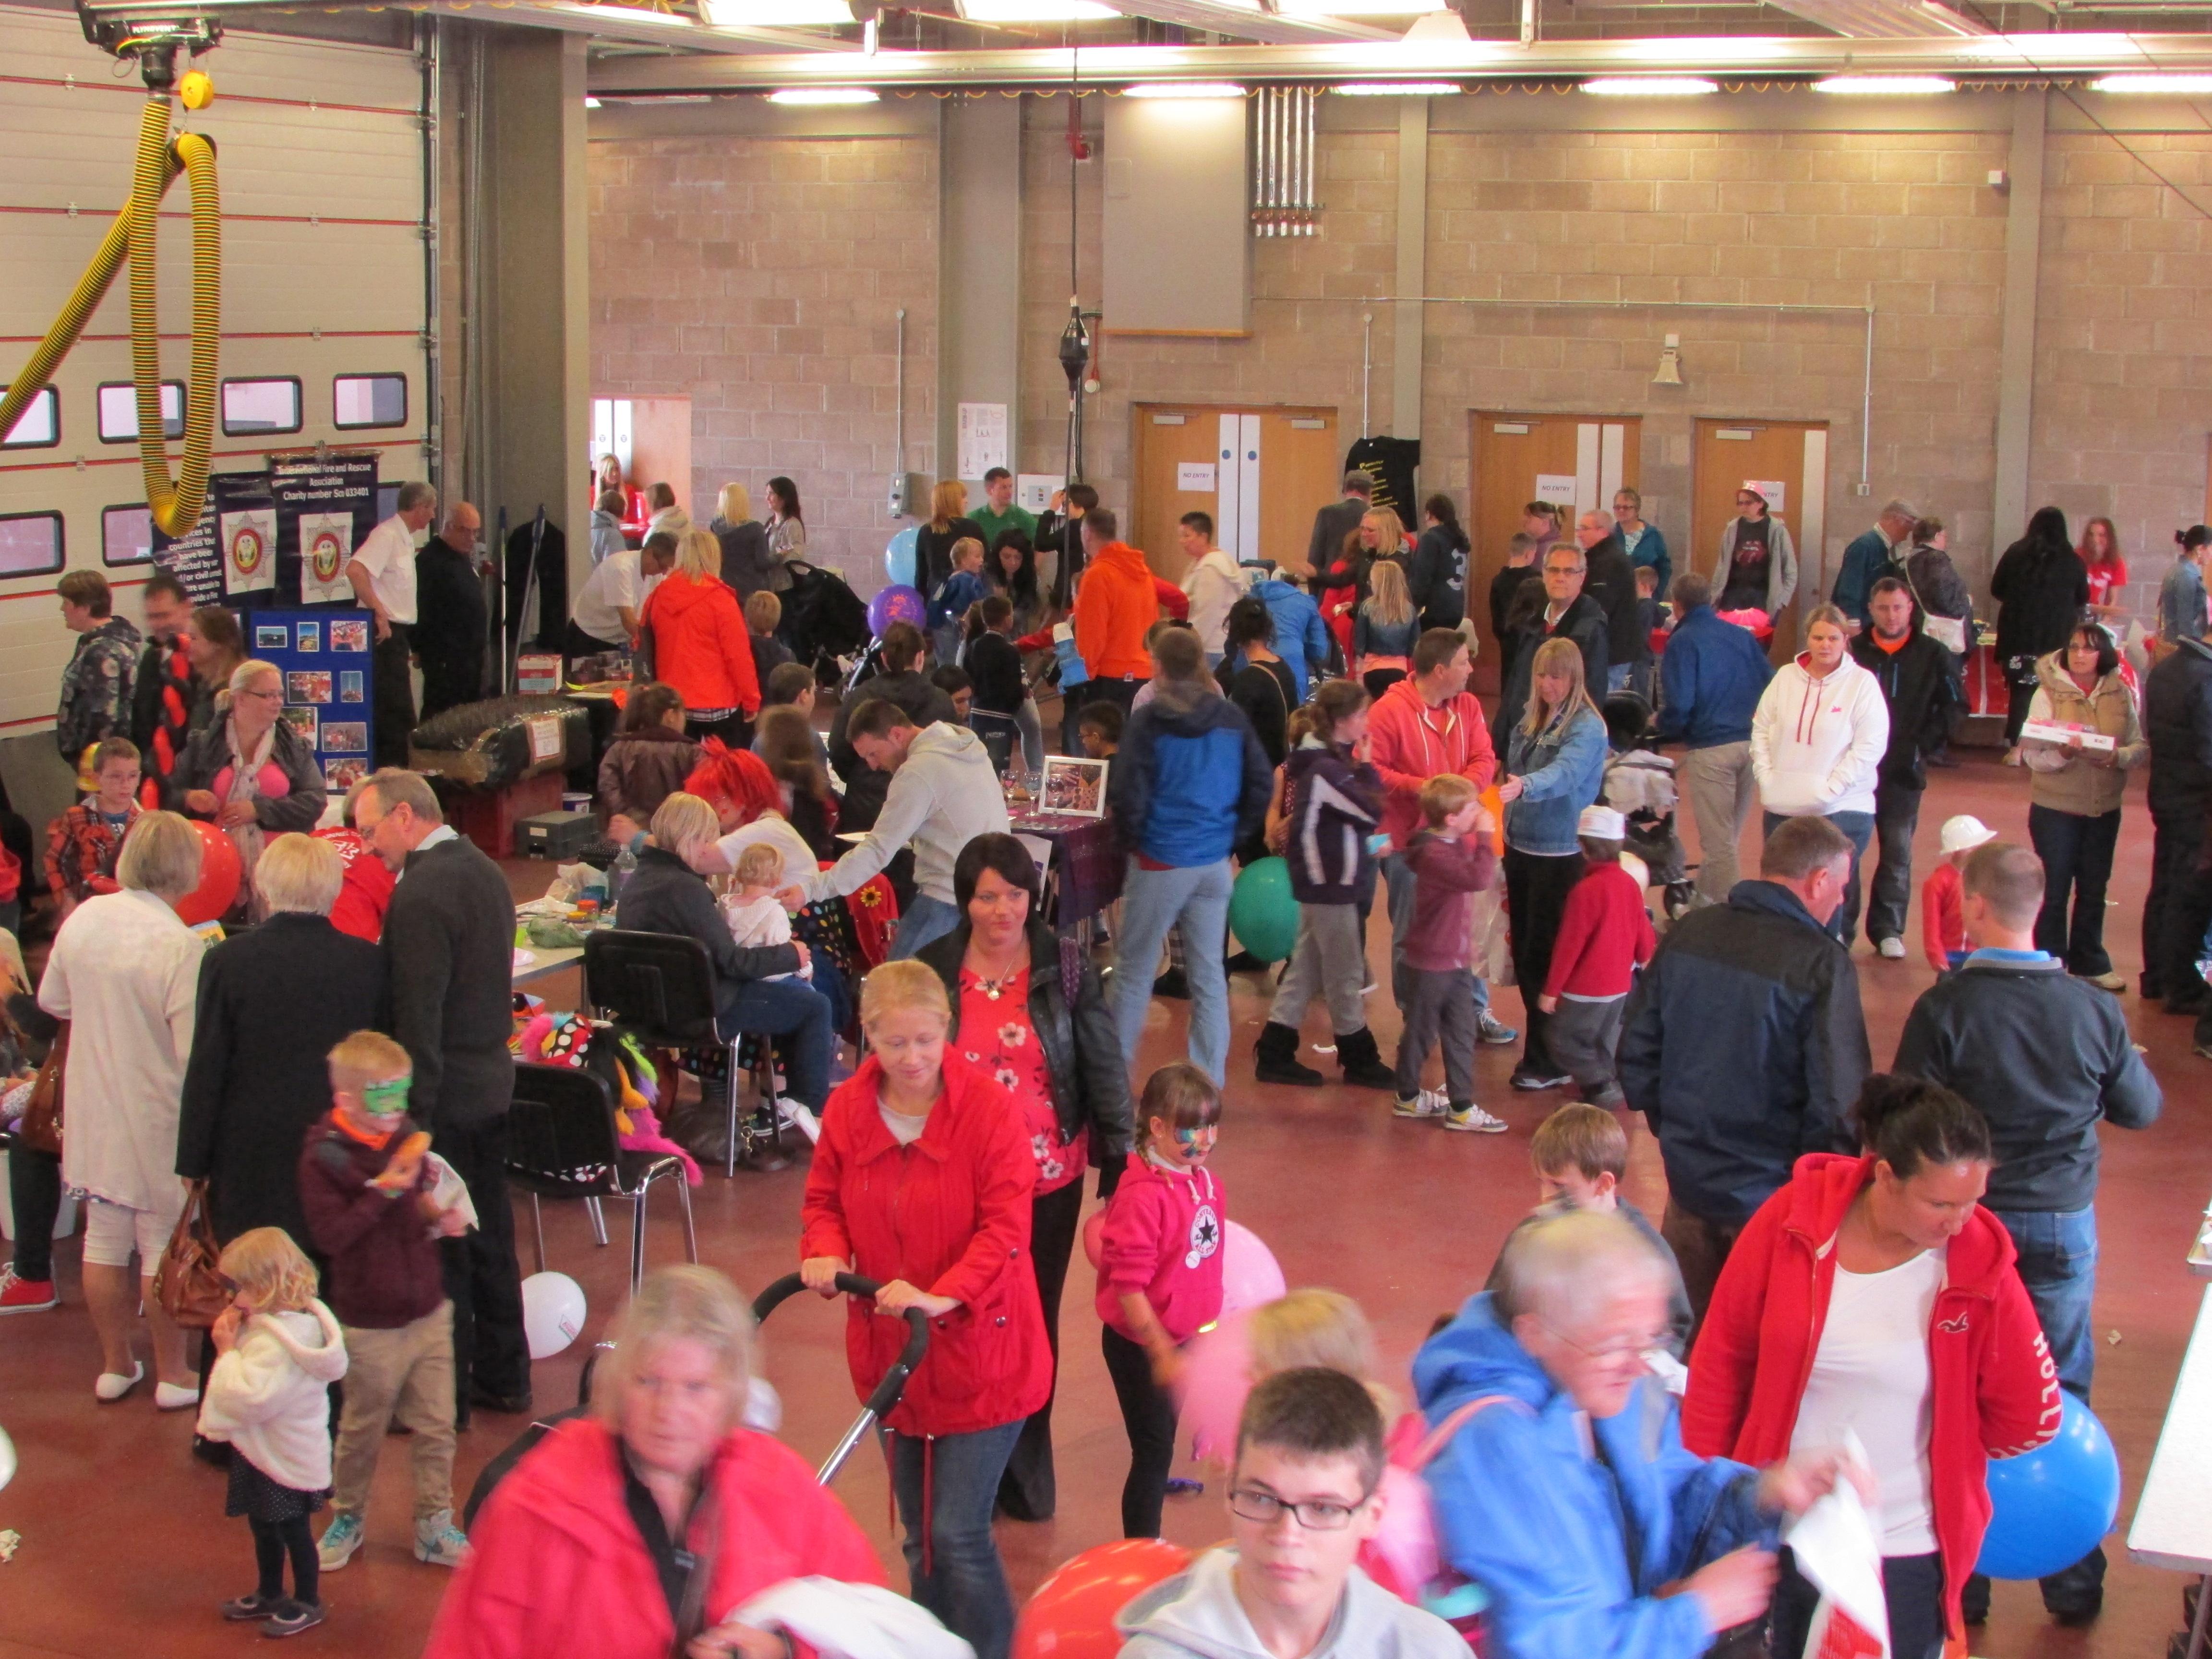 Dunfermline fire station open day success